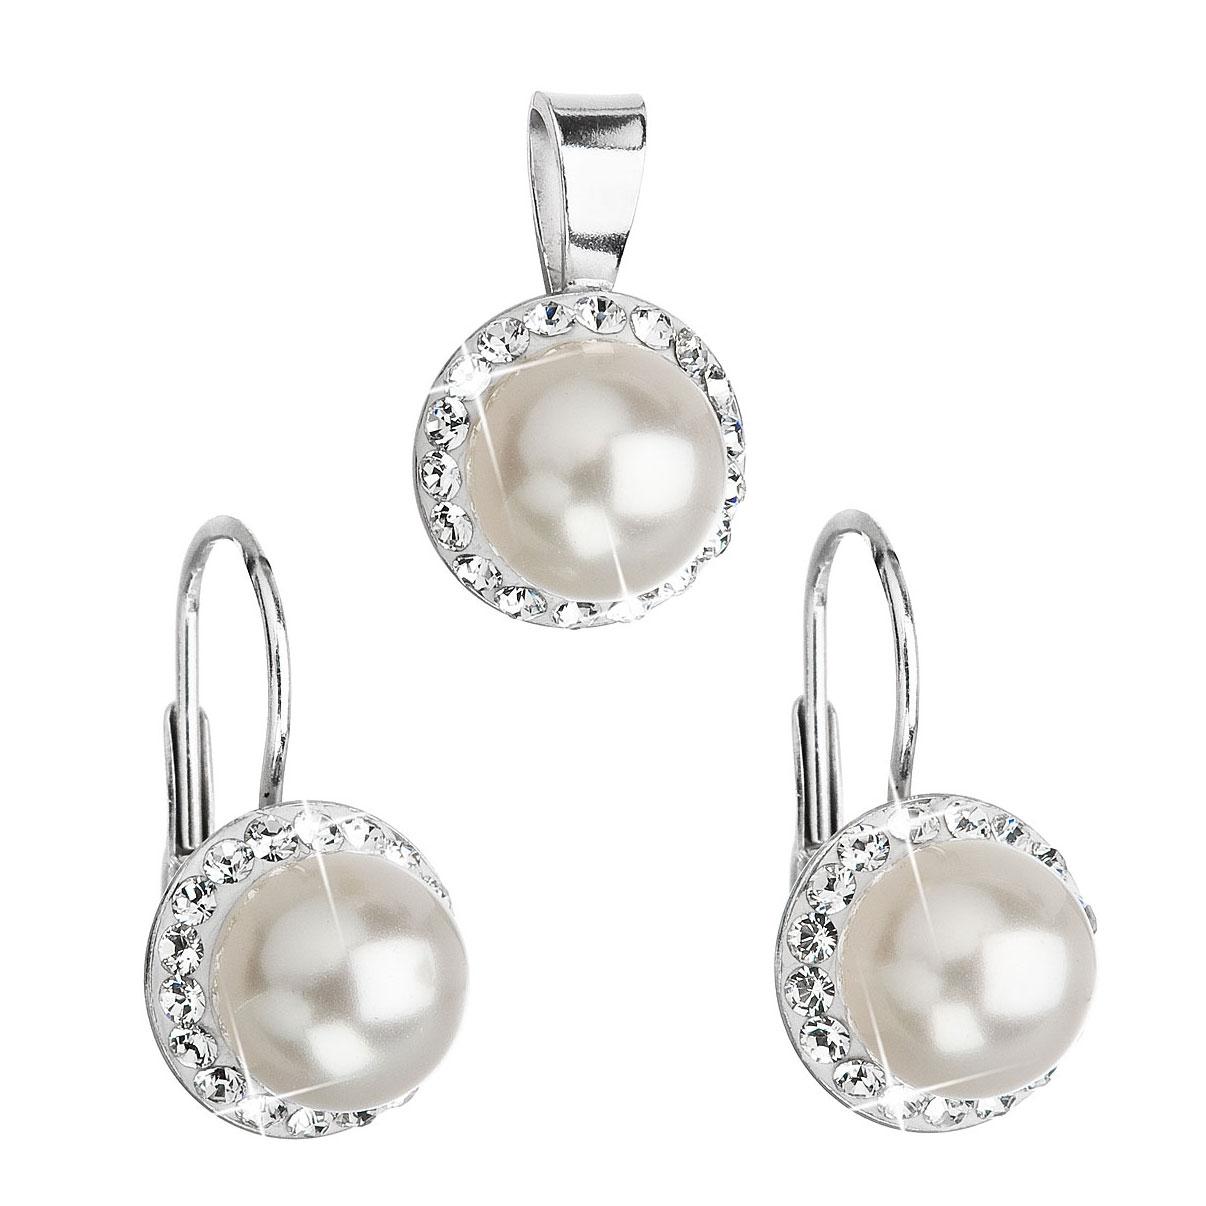 Sada šperků s perličkami Crystals from Swarovski® EG3036-WH